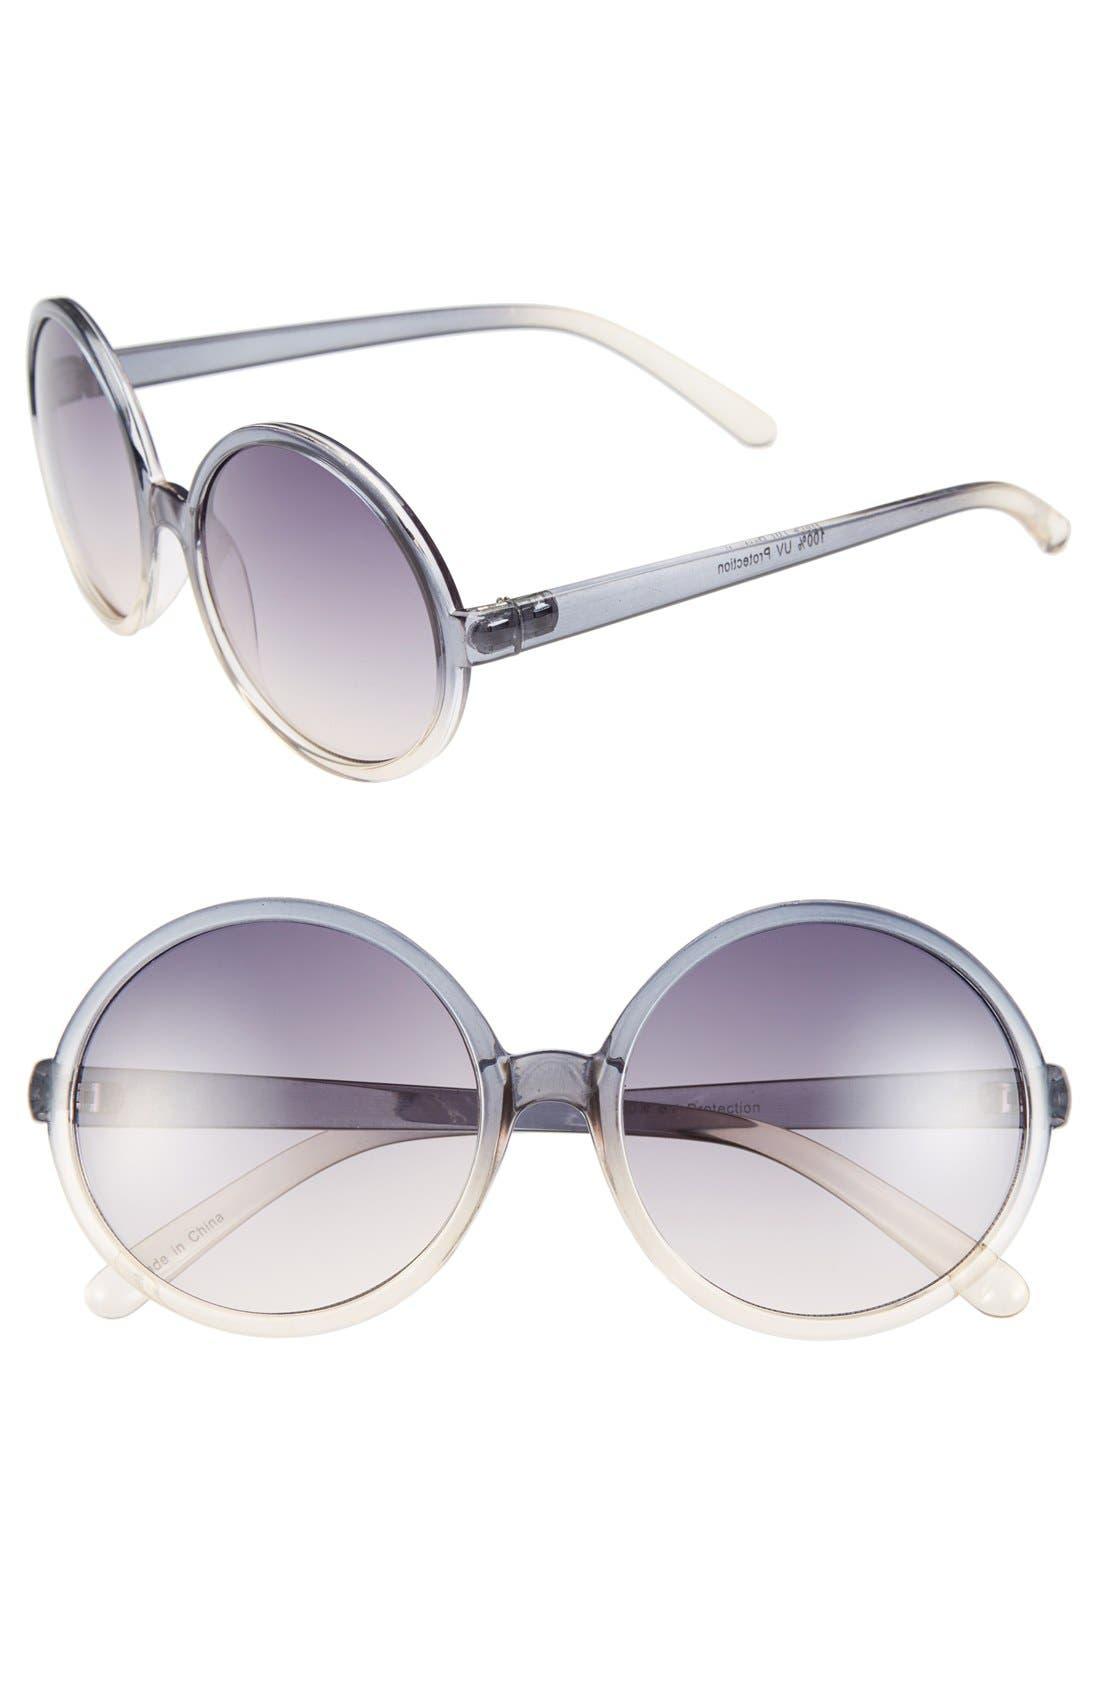 Main Image - Fantas Eyes 'Money Penny' 63mm Sunglasses (Juniors)